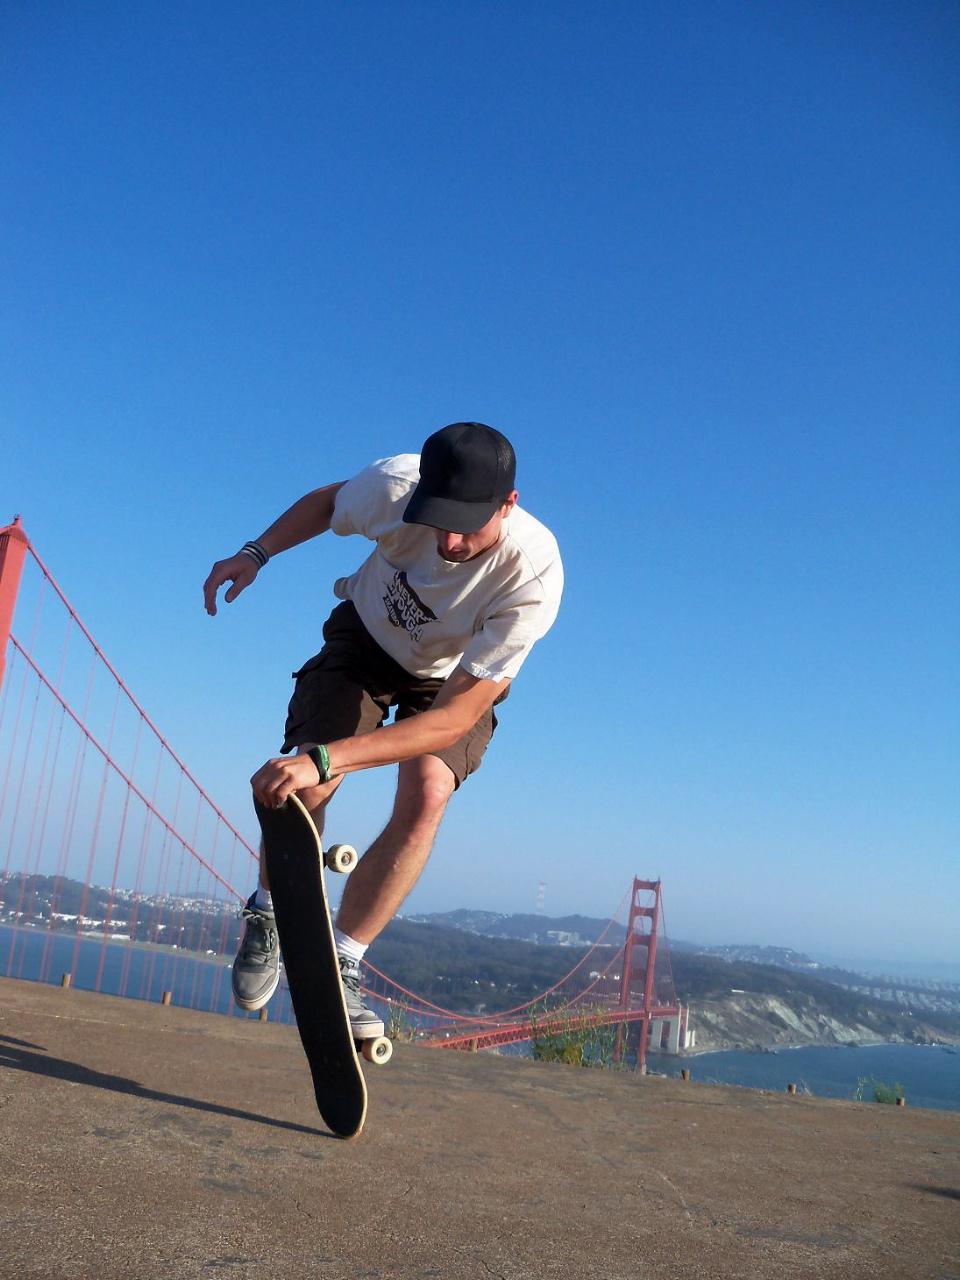 Skateboard Stunts